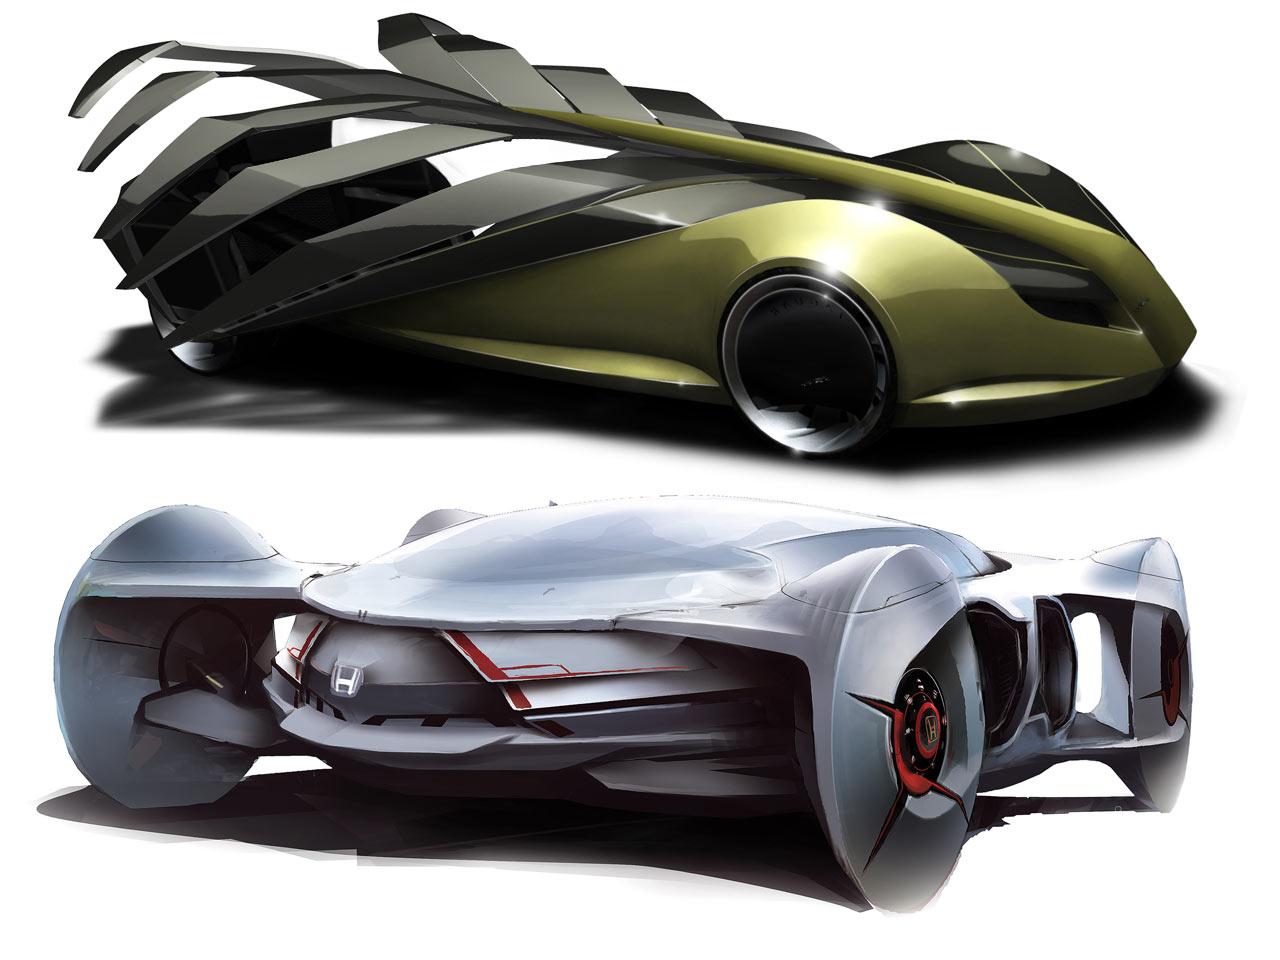 Futuristic Concept Cars - Car Body Design